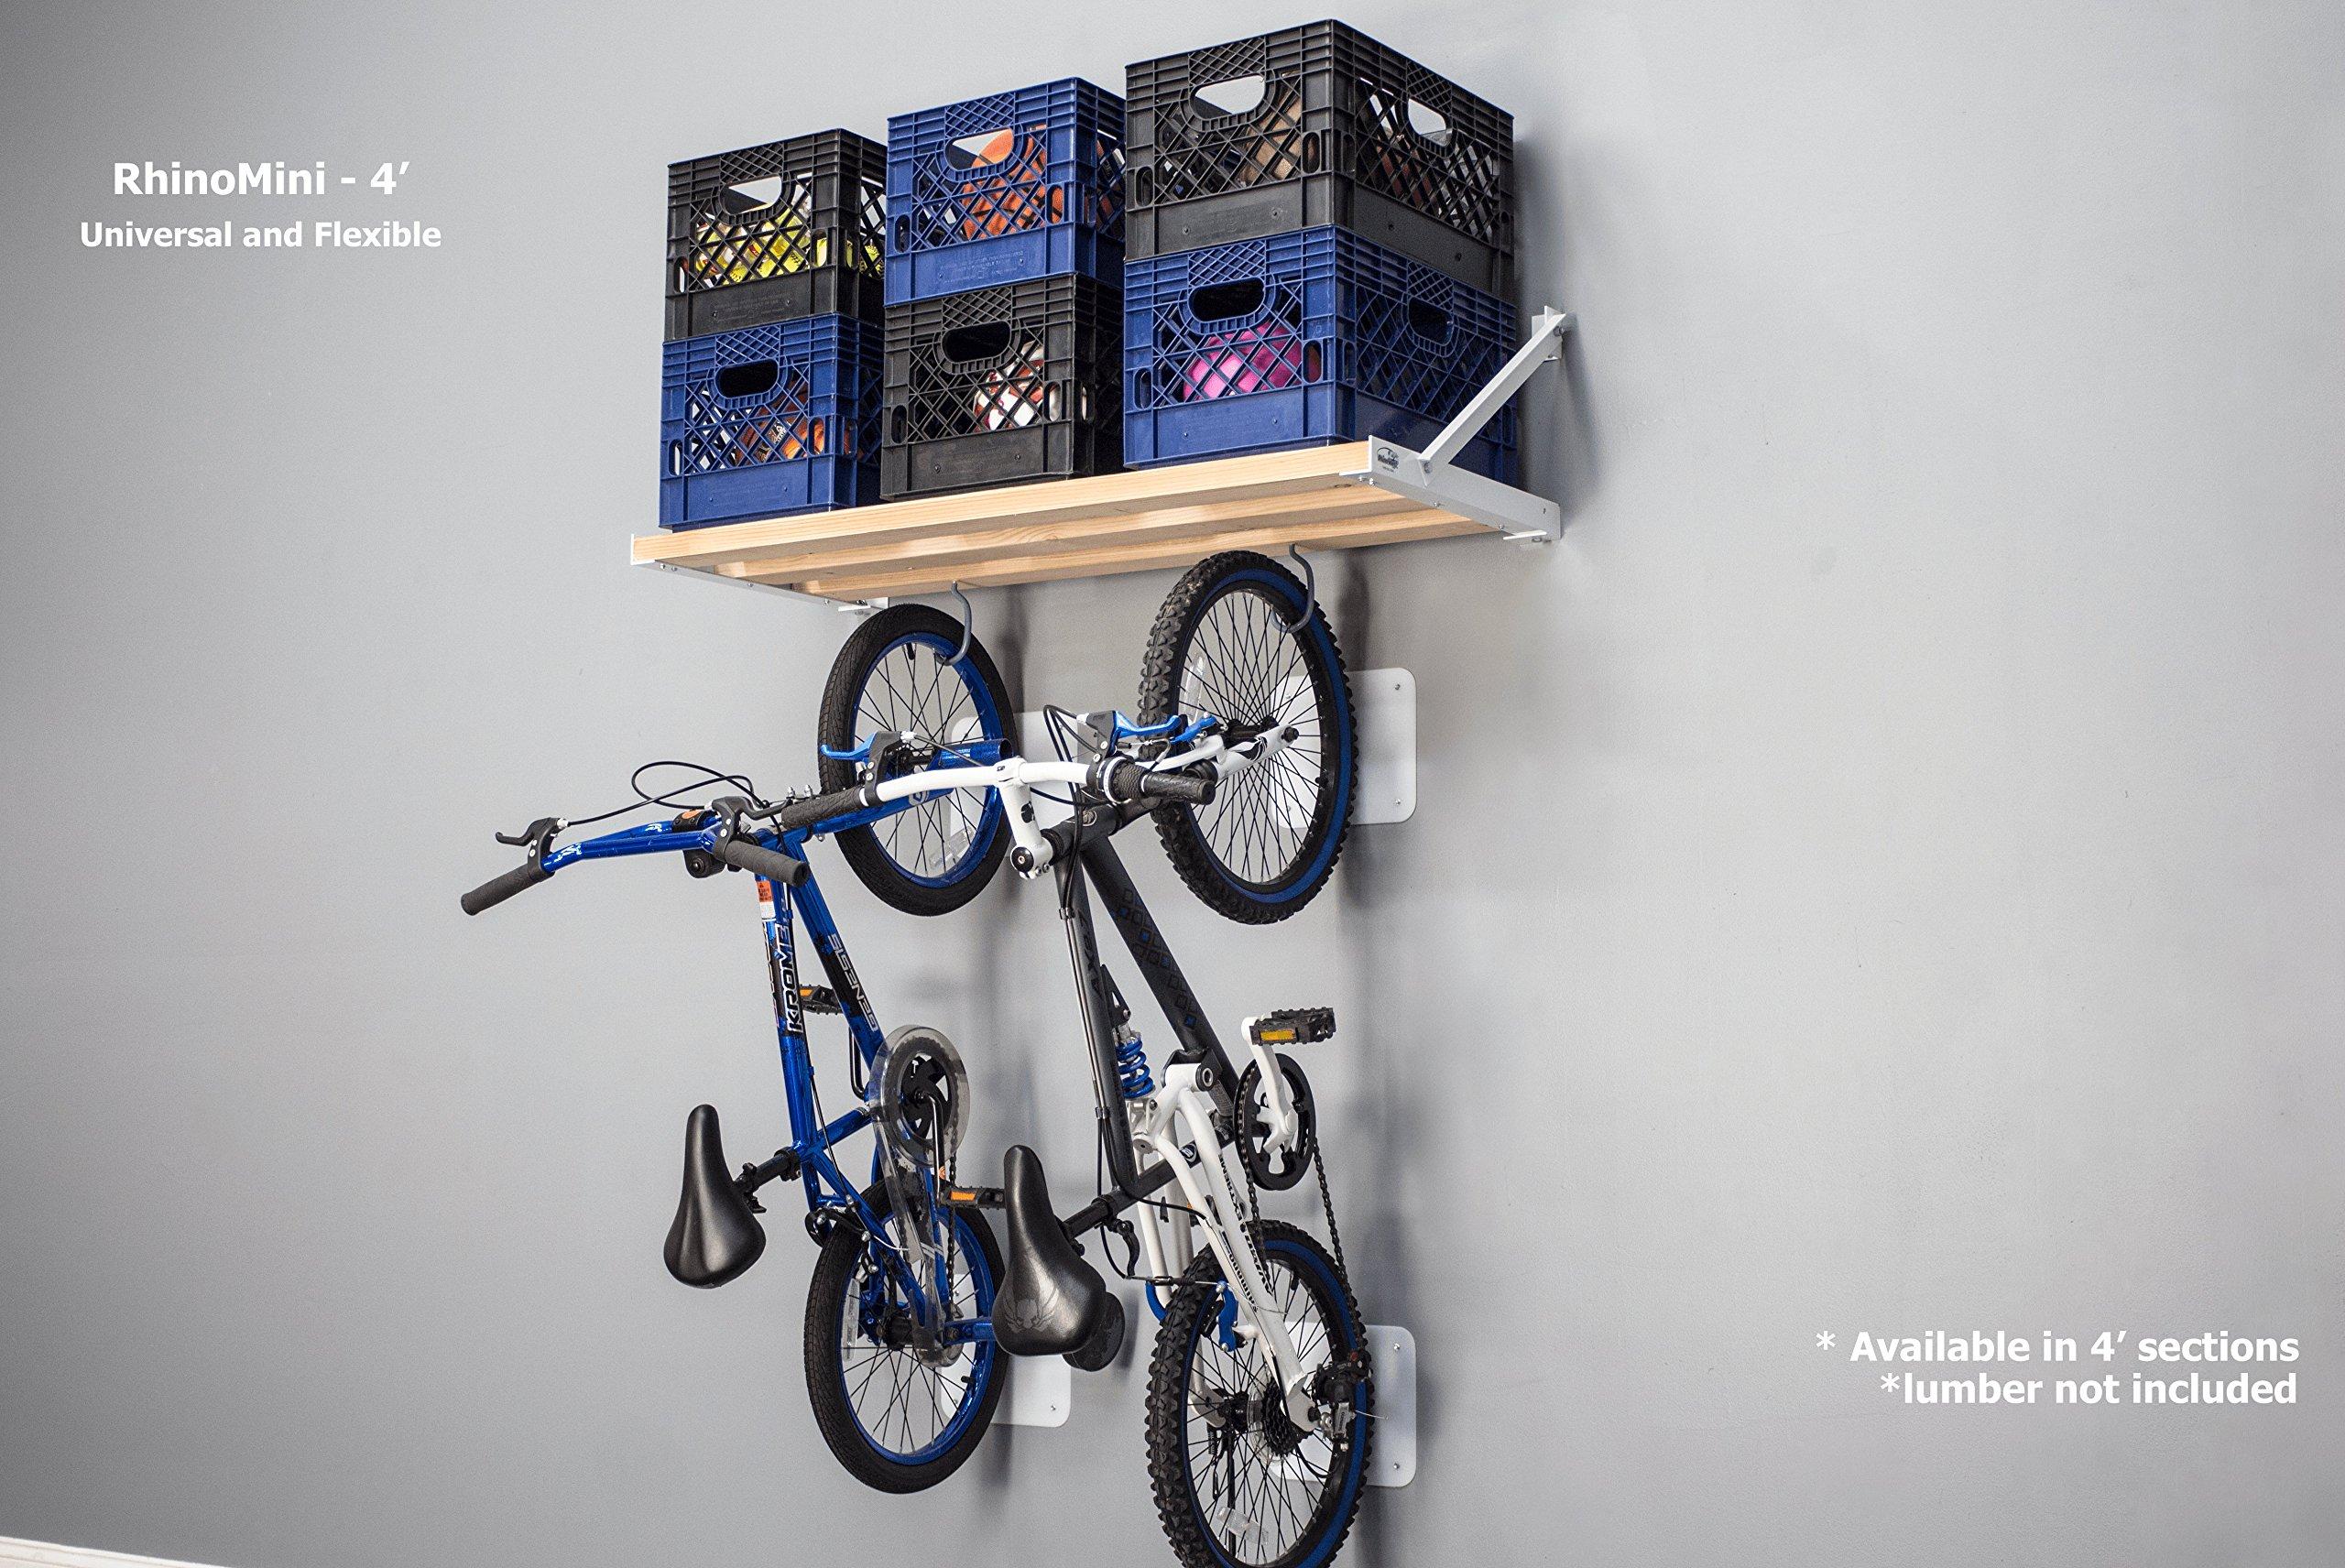 DIY RhinoMini Shelf Kits for Garages & Other Applications (4' Length; 20'' Width) by RhinoShelf.com